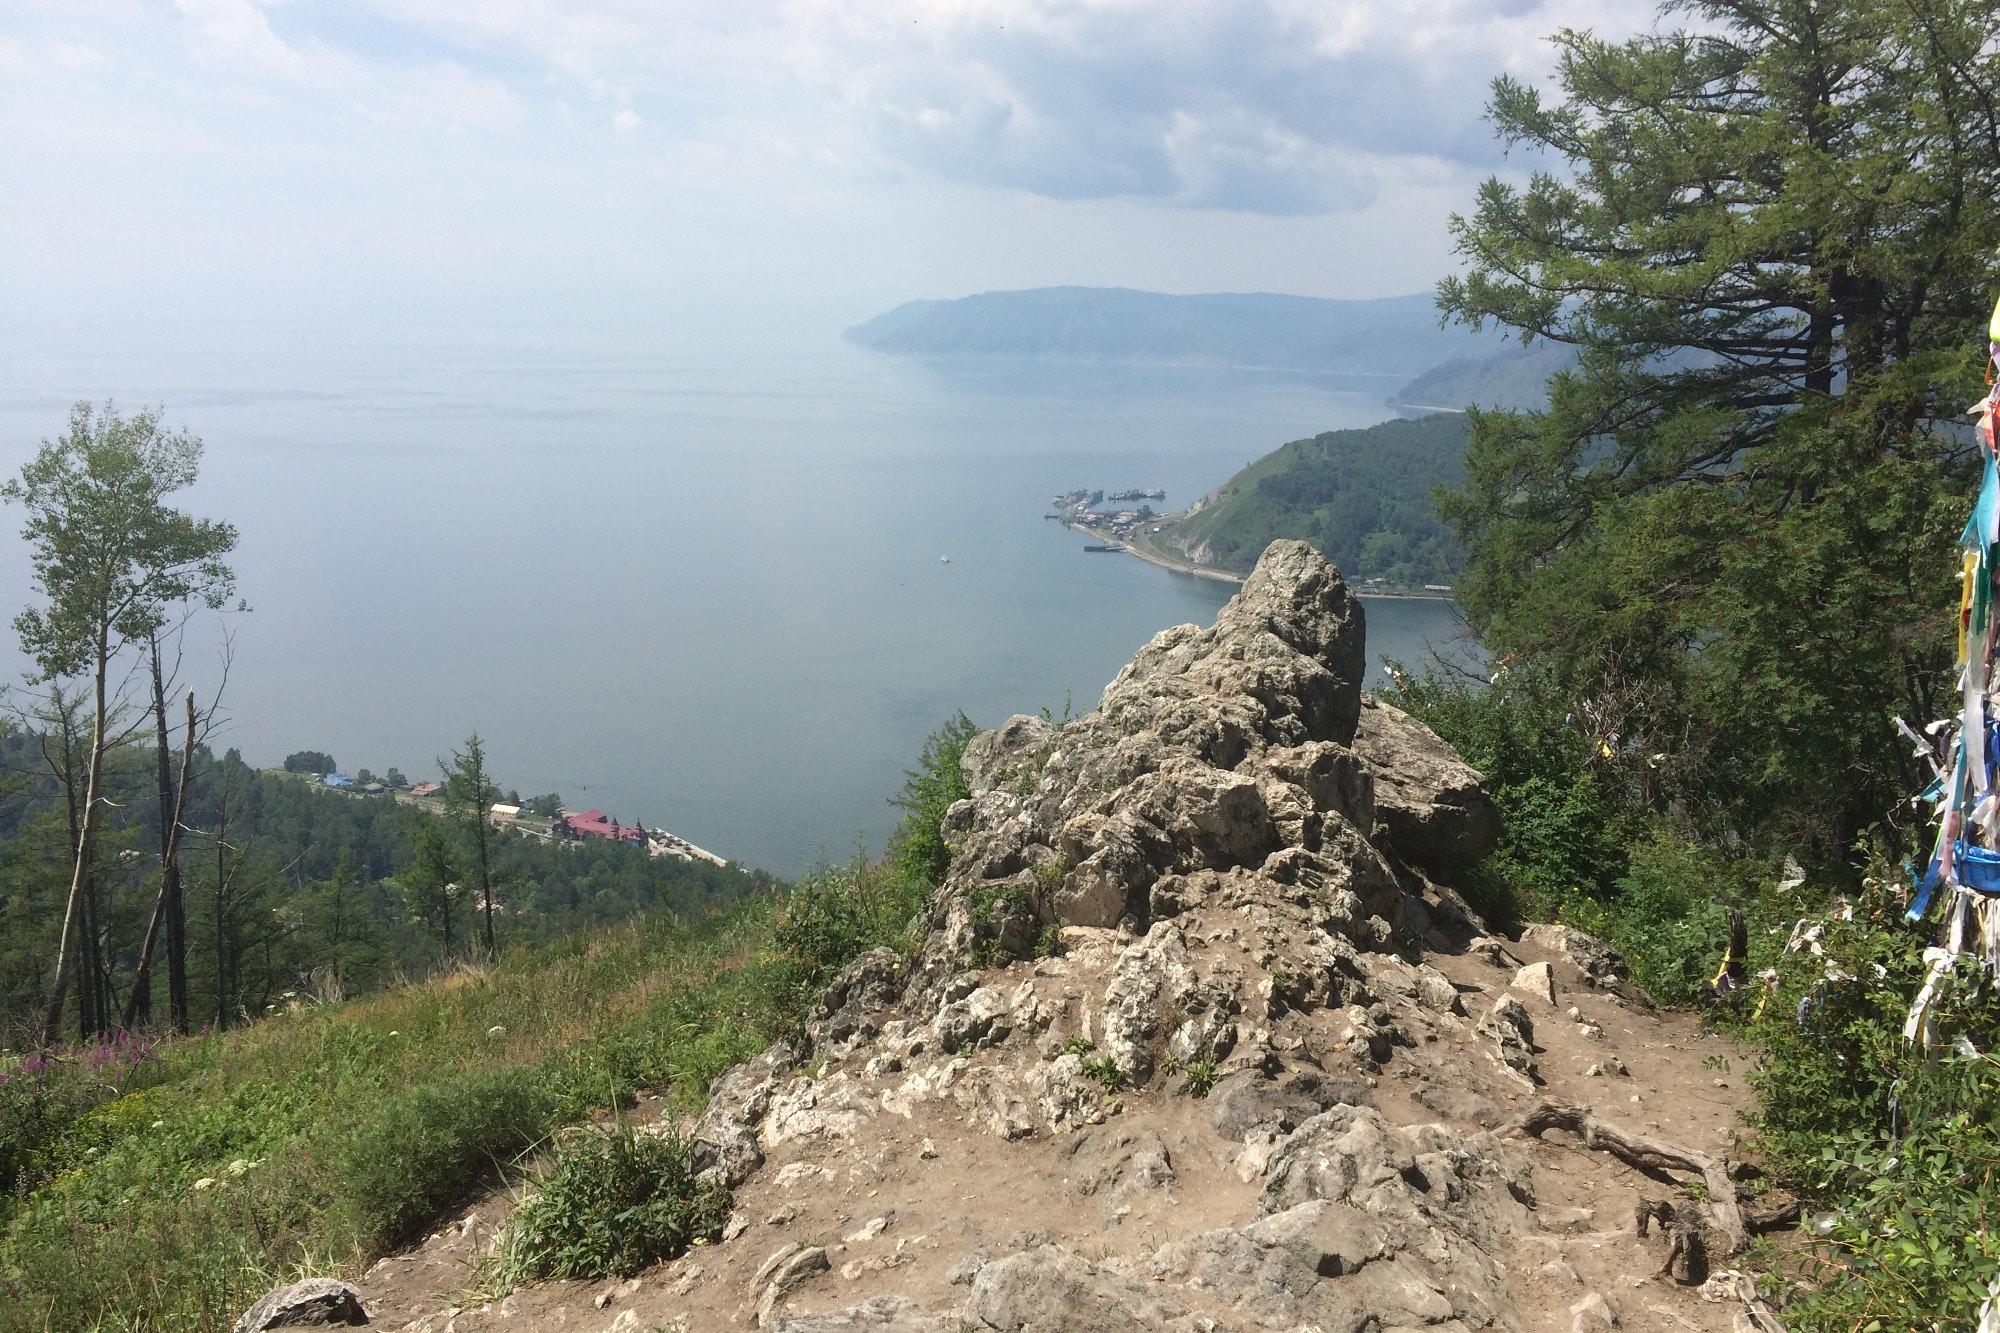 Beautiful views over Lake Baikal